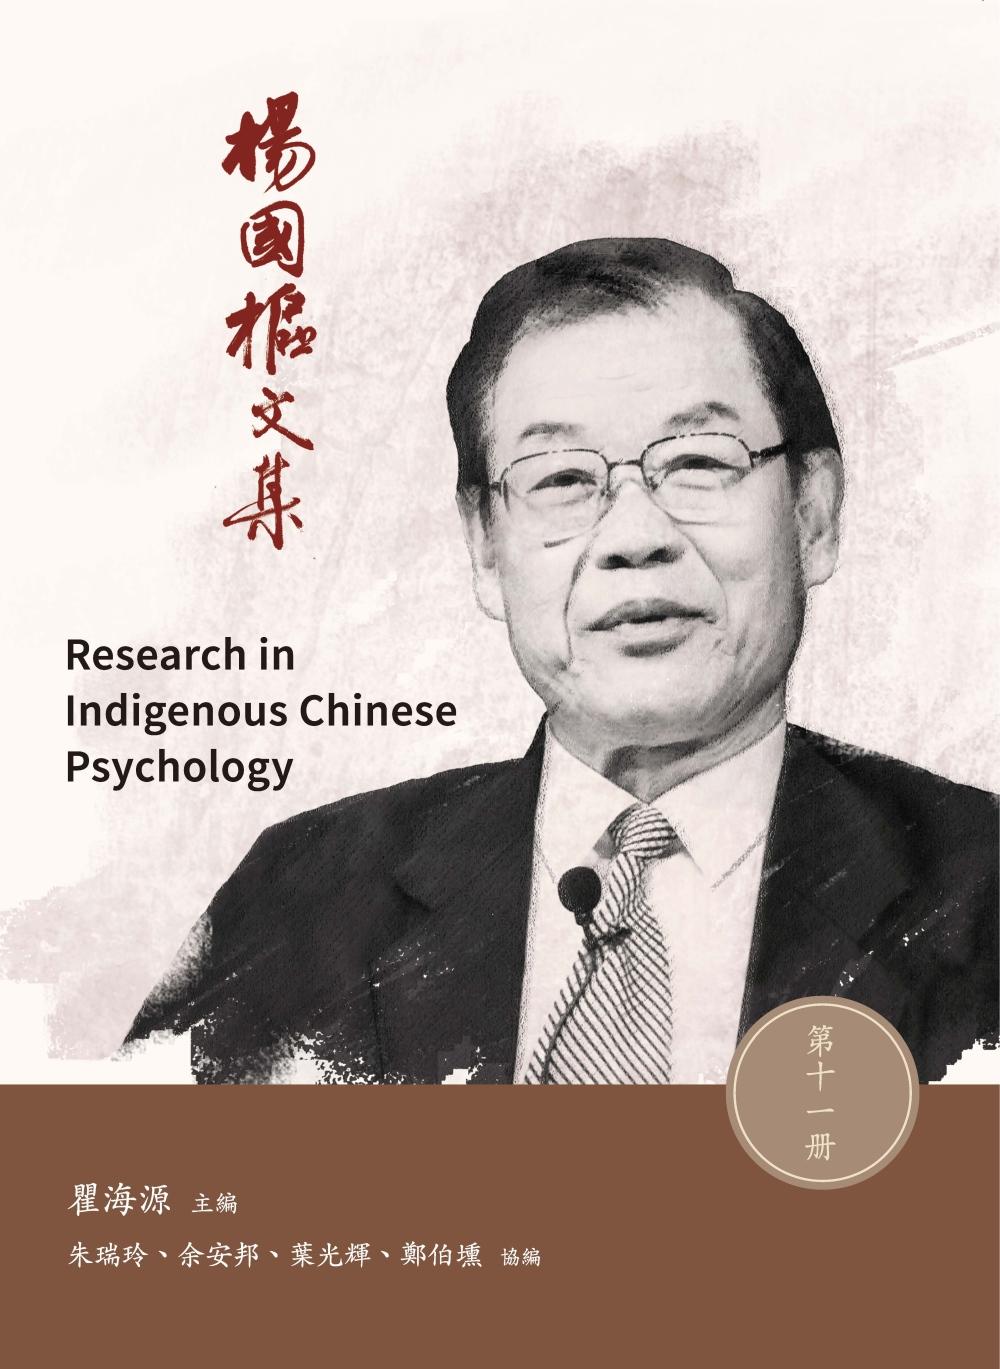 楊國樞文集 第十一冊:Research in Indigenous Chinese Psychology